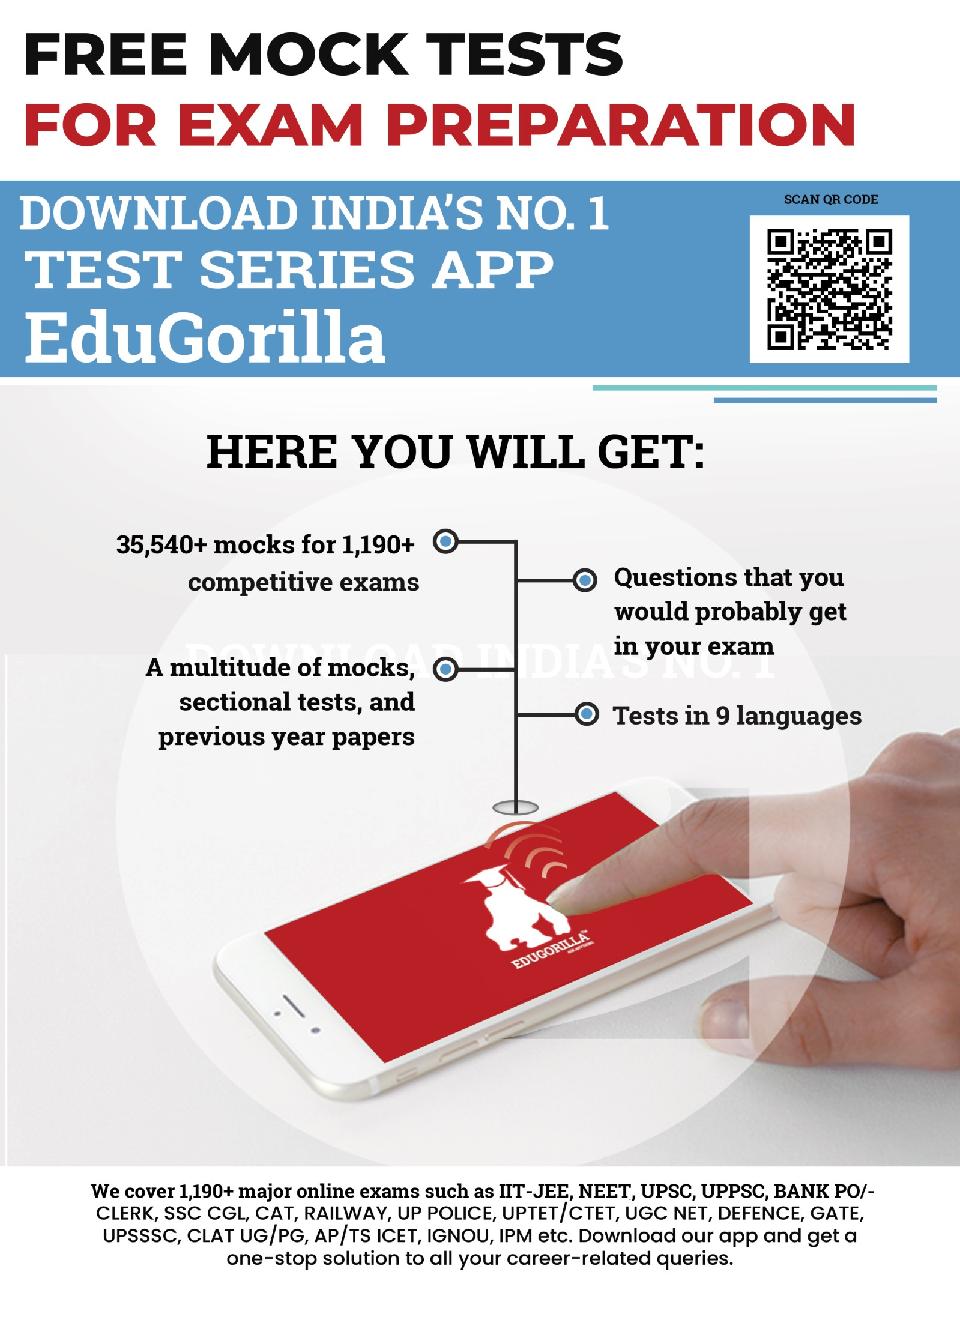 EduGorilla All India Bar Examination (Bar Council) 2020   10 Mock tests + 6 Practice Tests - Page 2